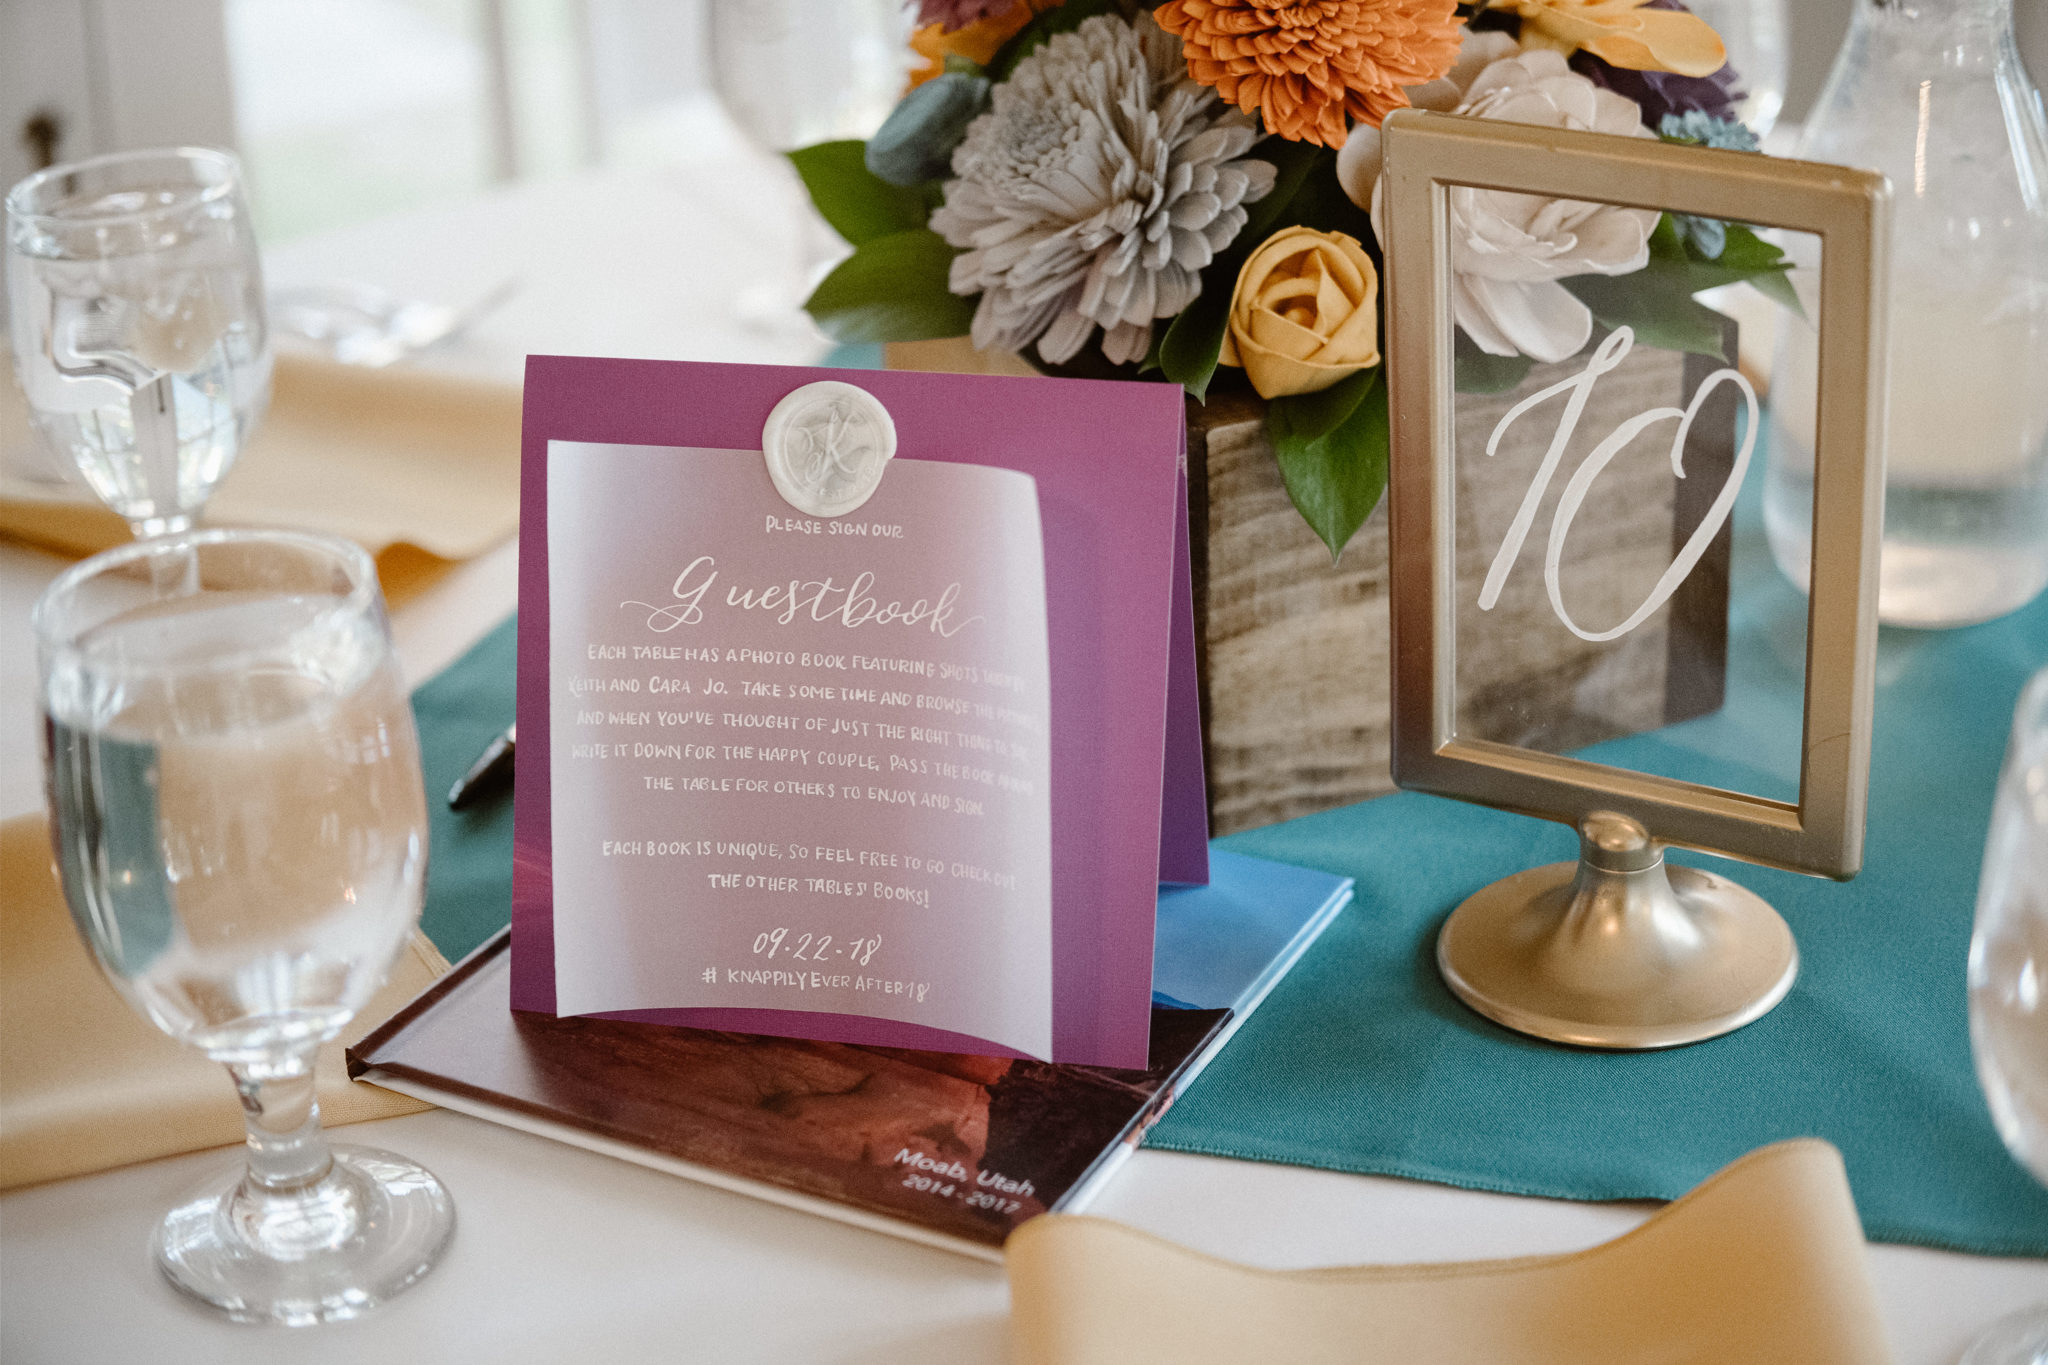 cara-jo-keith-grant-humphreys-mansion-wedding-7-39.jpg